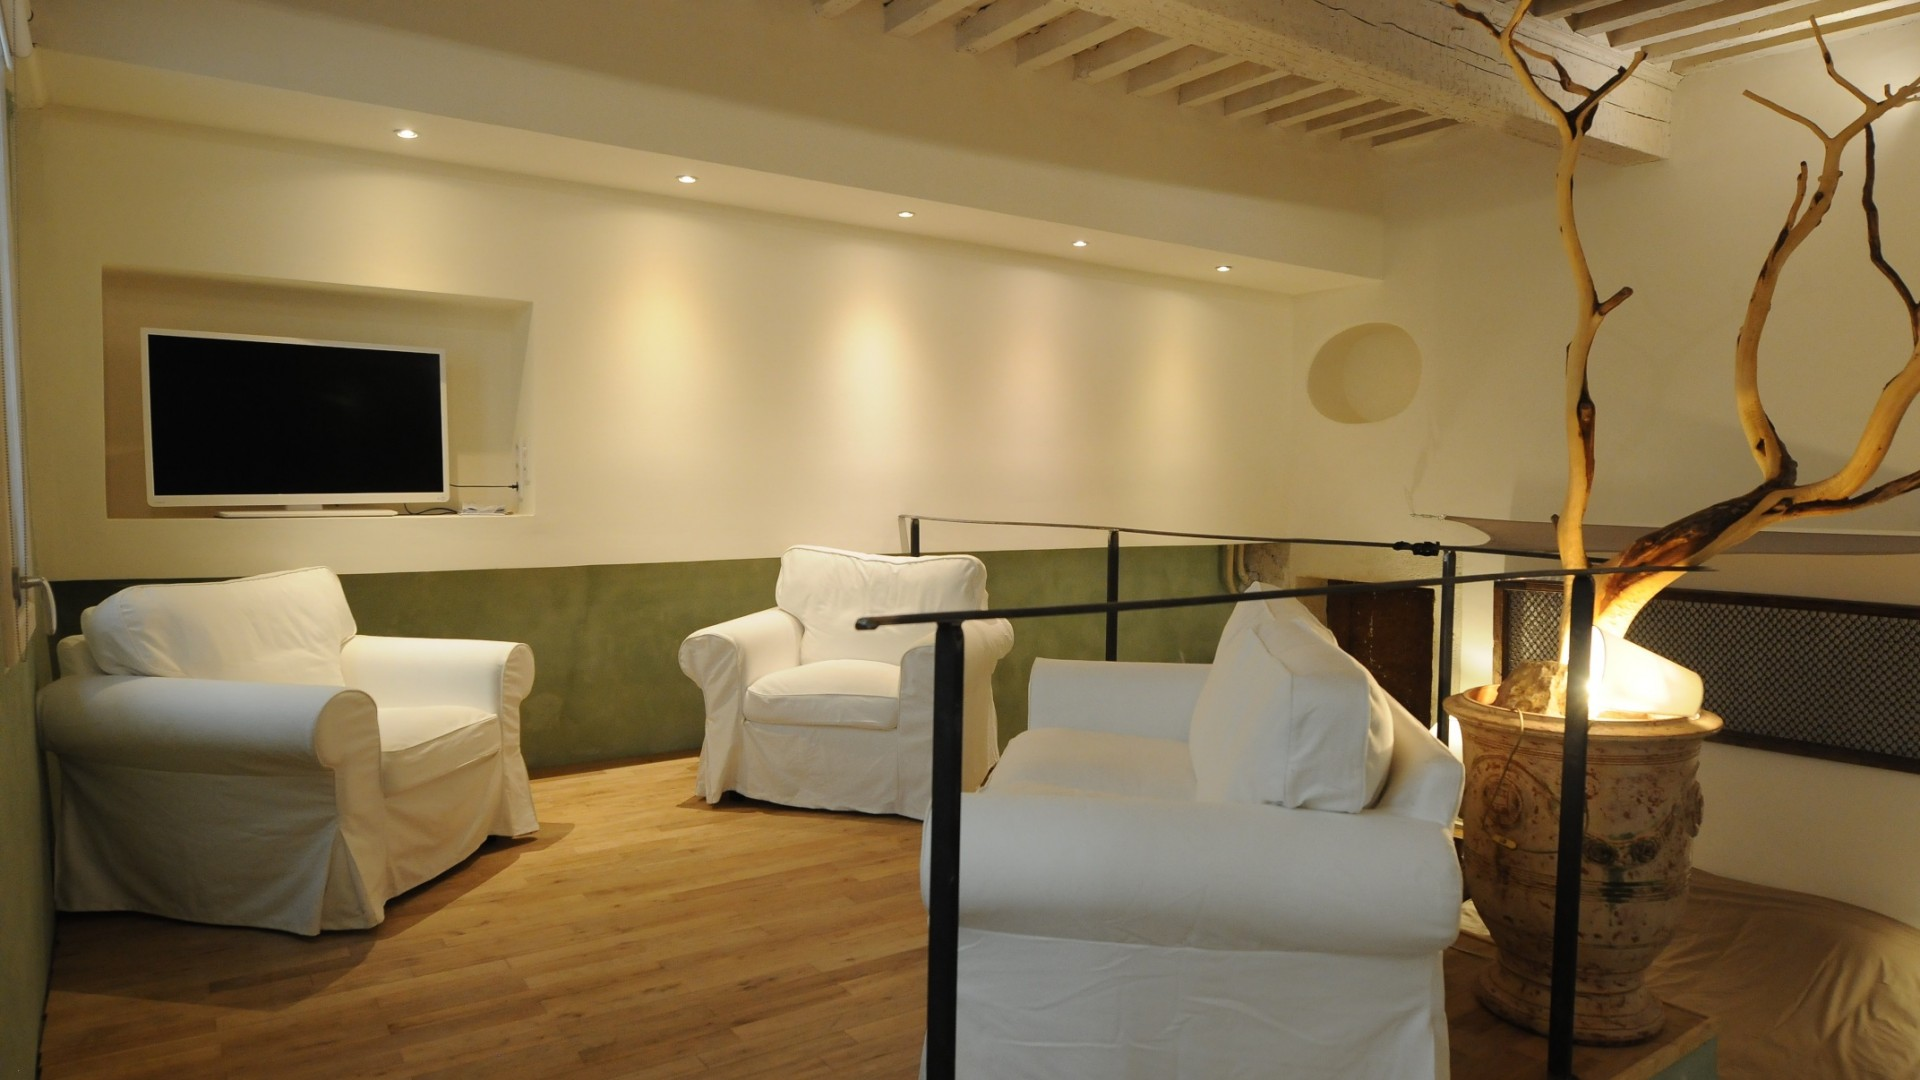 Living room corner on an platform on the window level